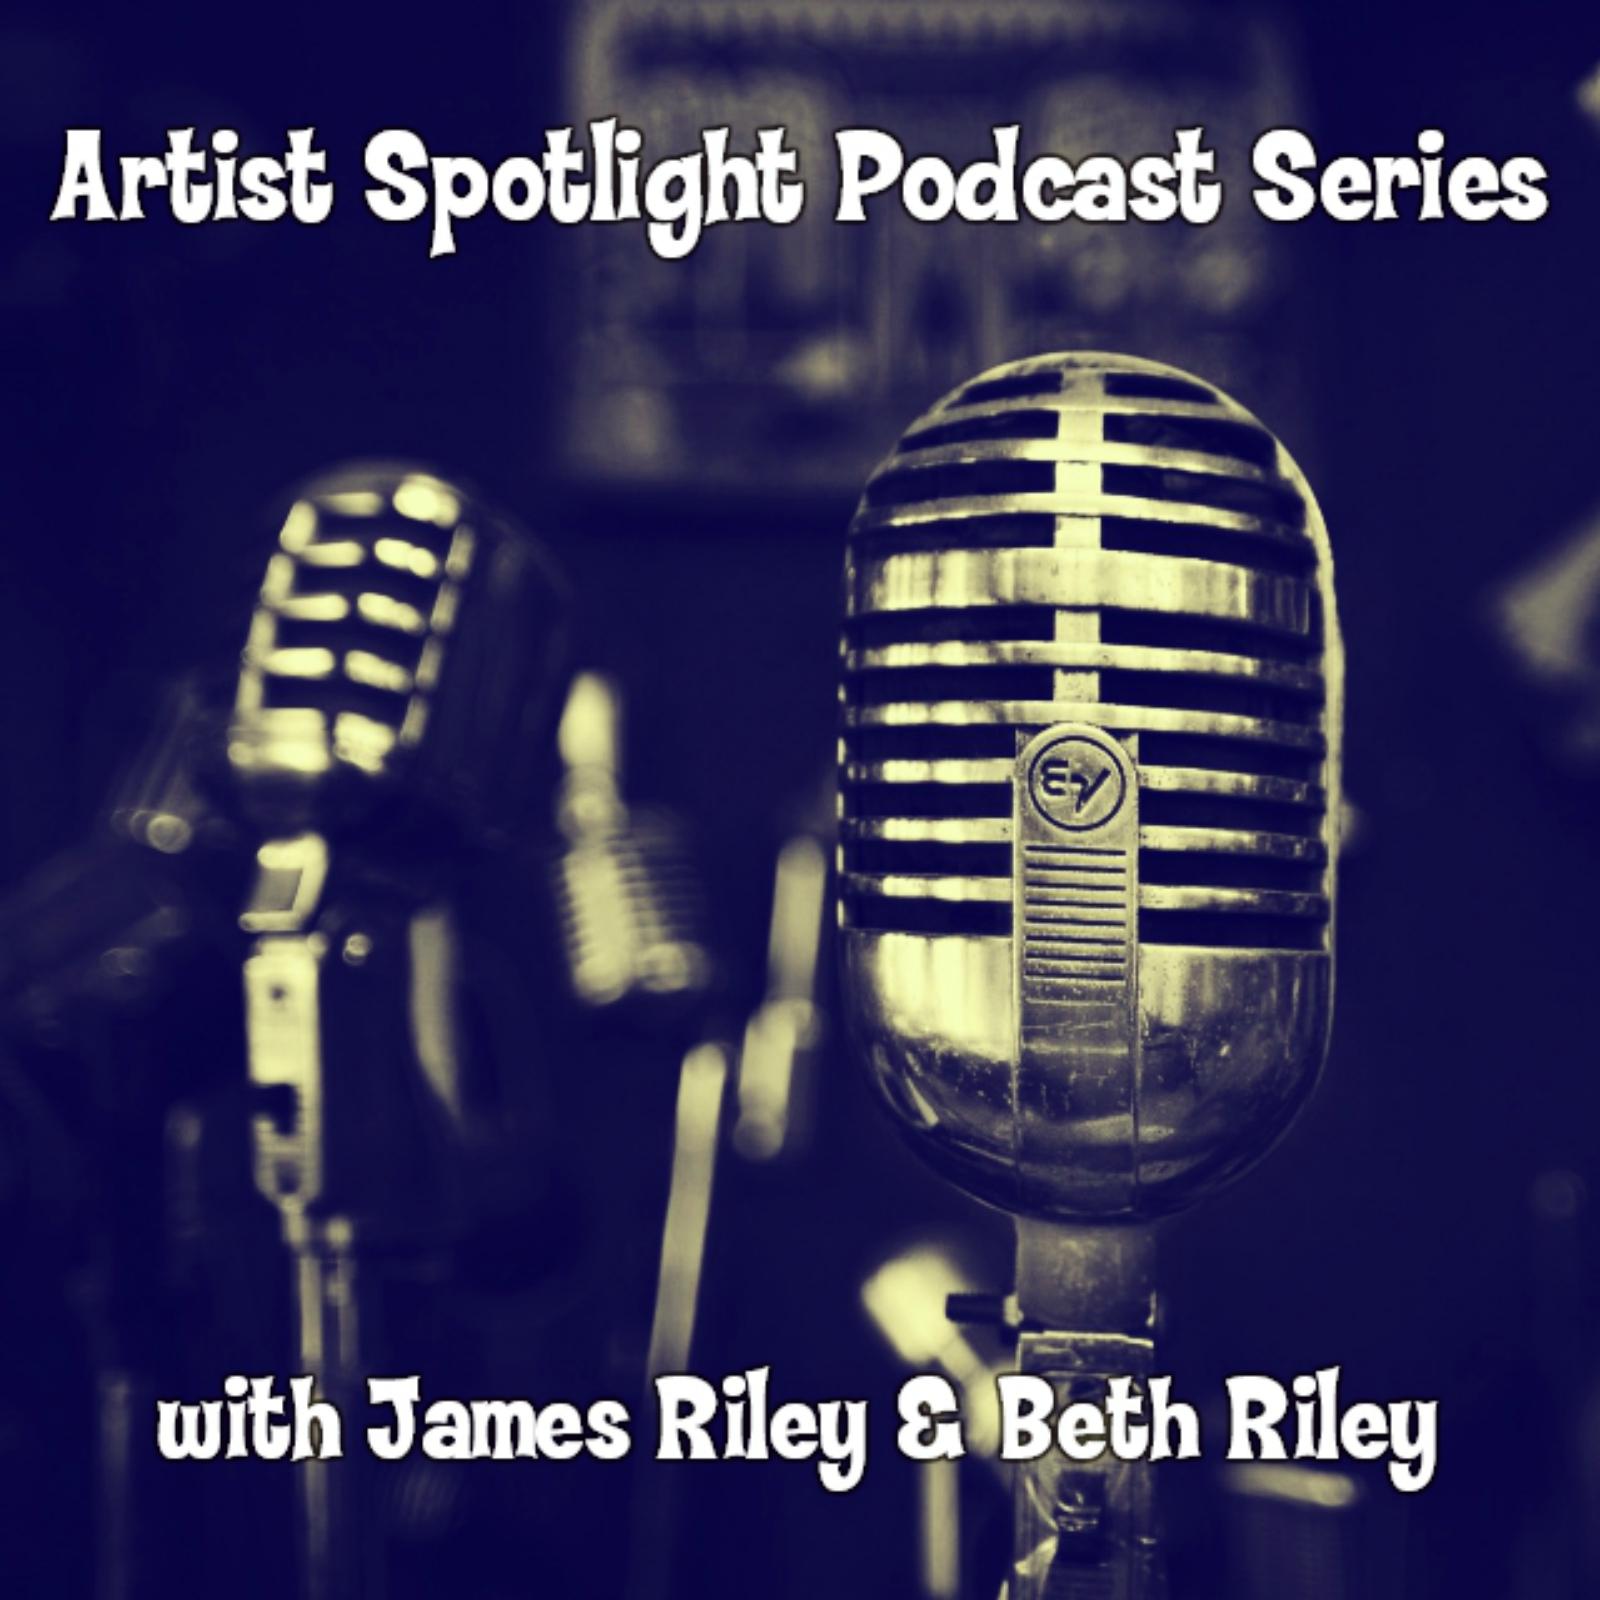 Artwork for Artist Spotlight Podcast Series: Bruce Iglauer of Alligator Records (with Beth Riley 2015)